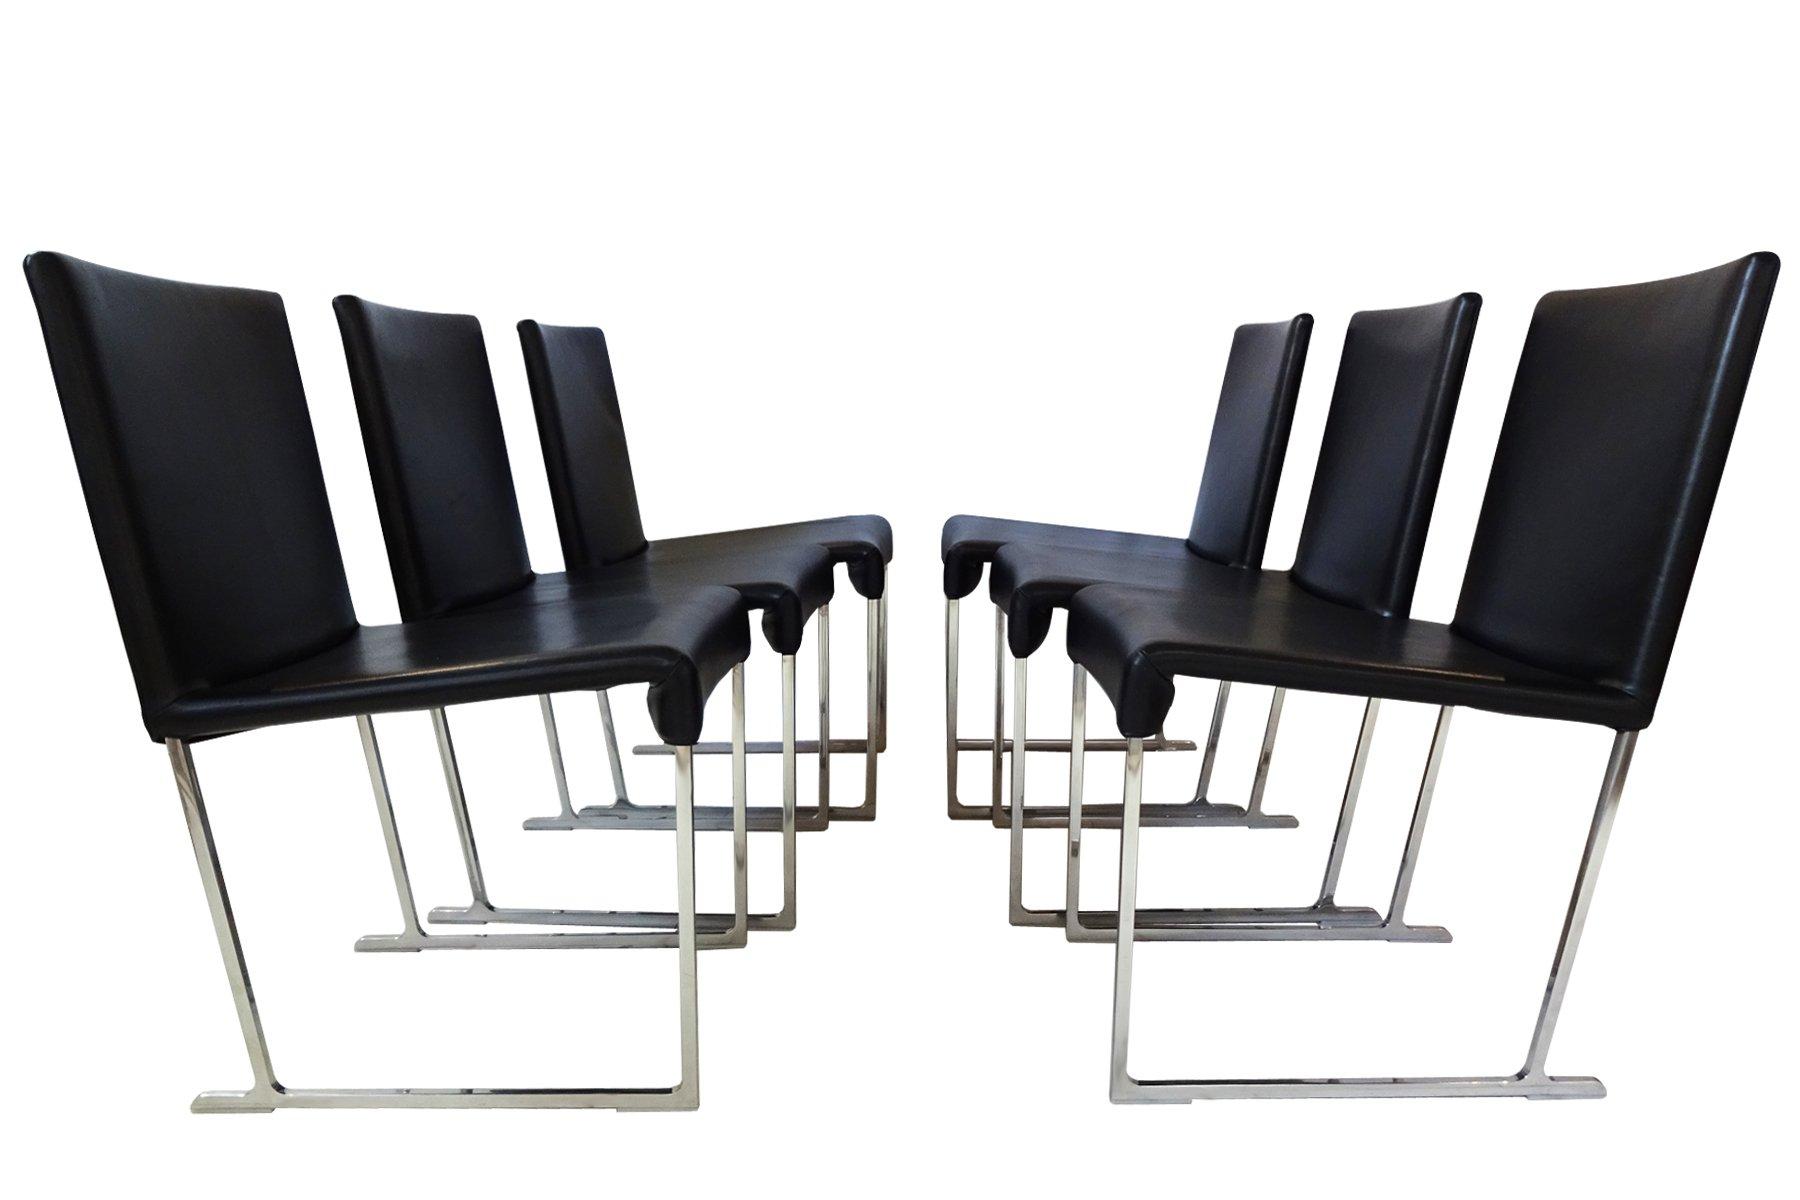 maxalto solo esszimmerst hle aus schwarzem leder von antonio citterio f r b b italia 2006 6er. Black Bedroom Furniture Sets. Home Design Ideas